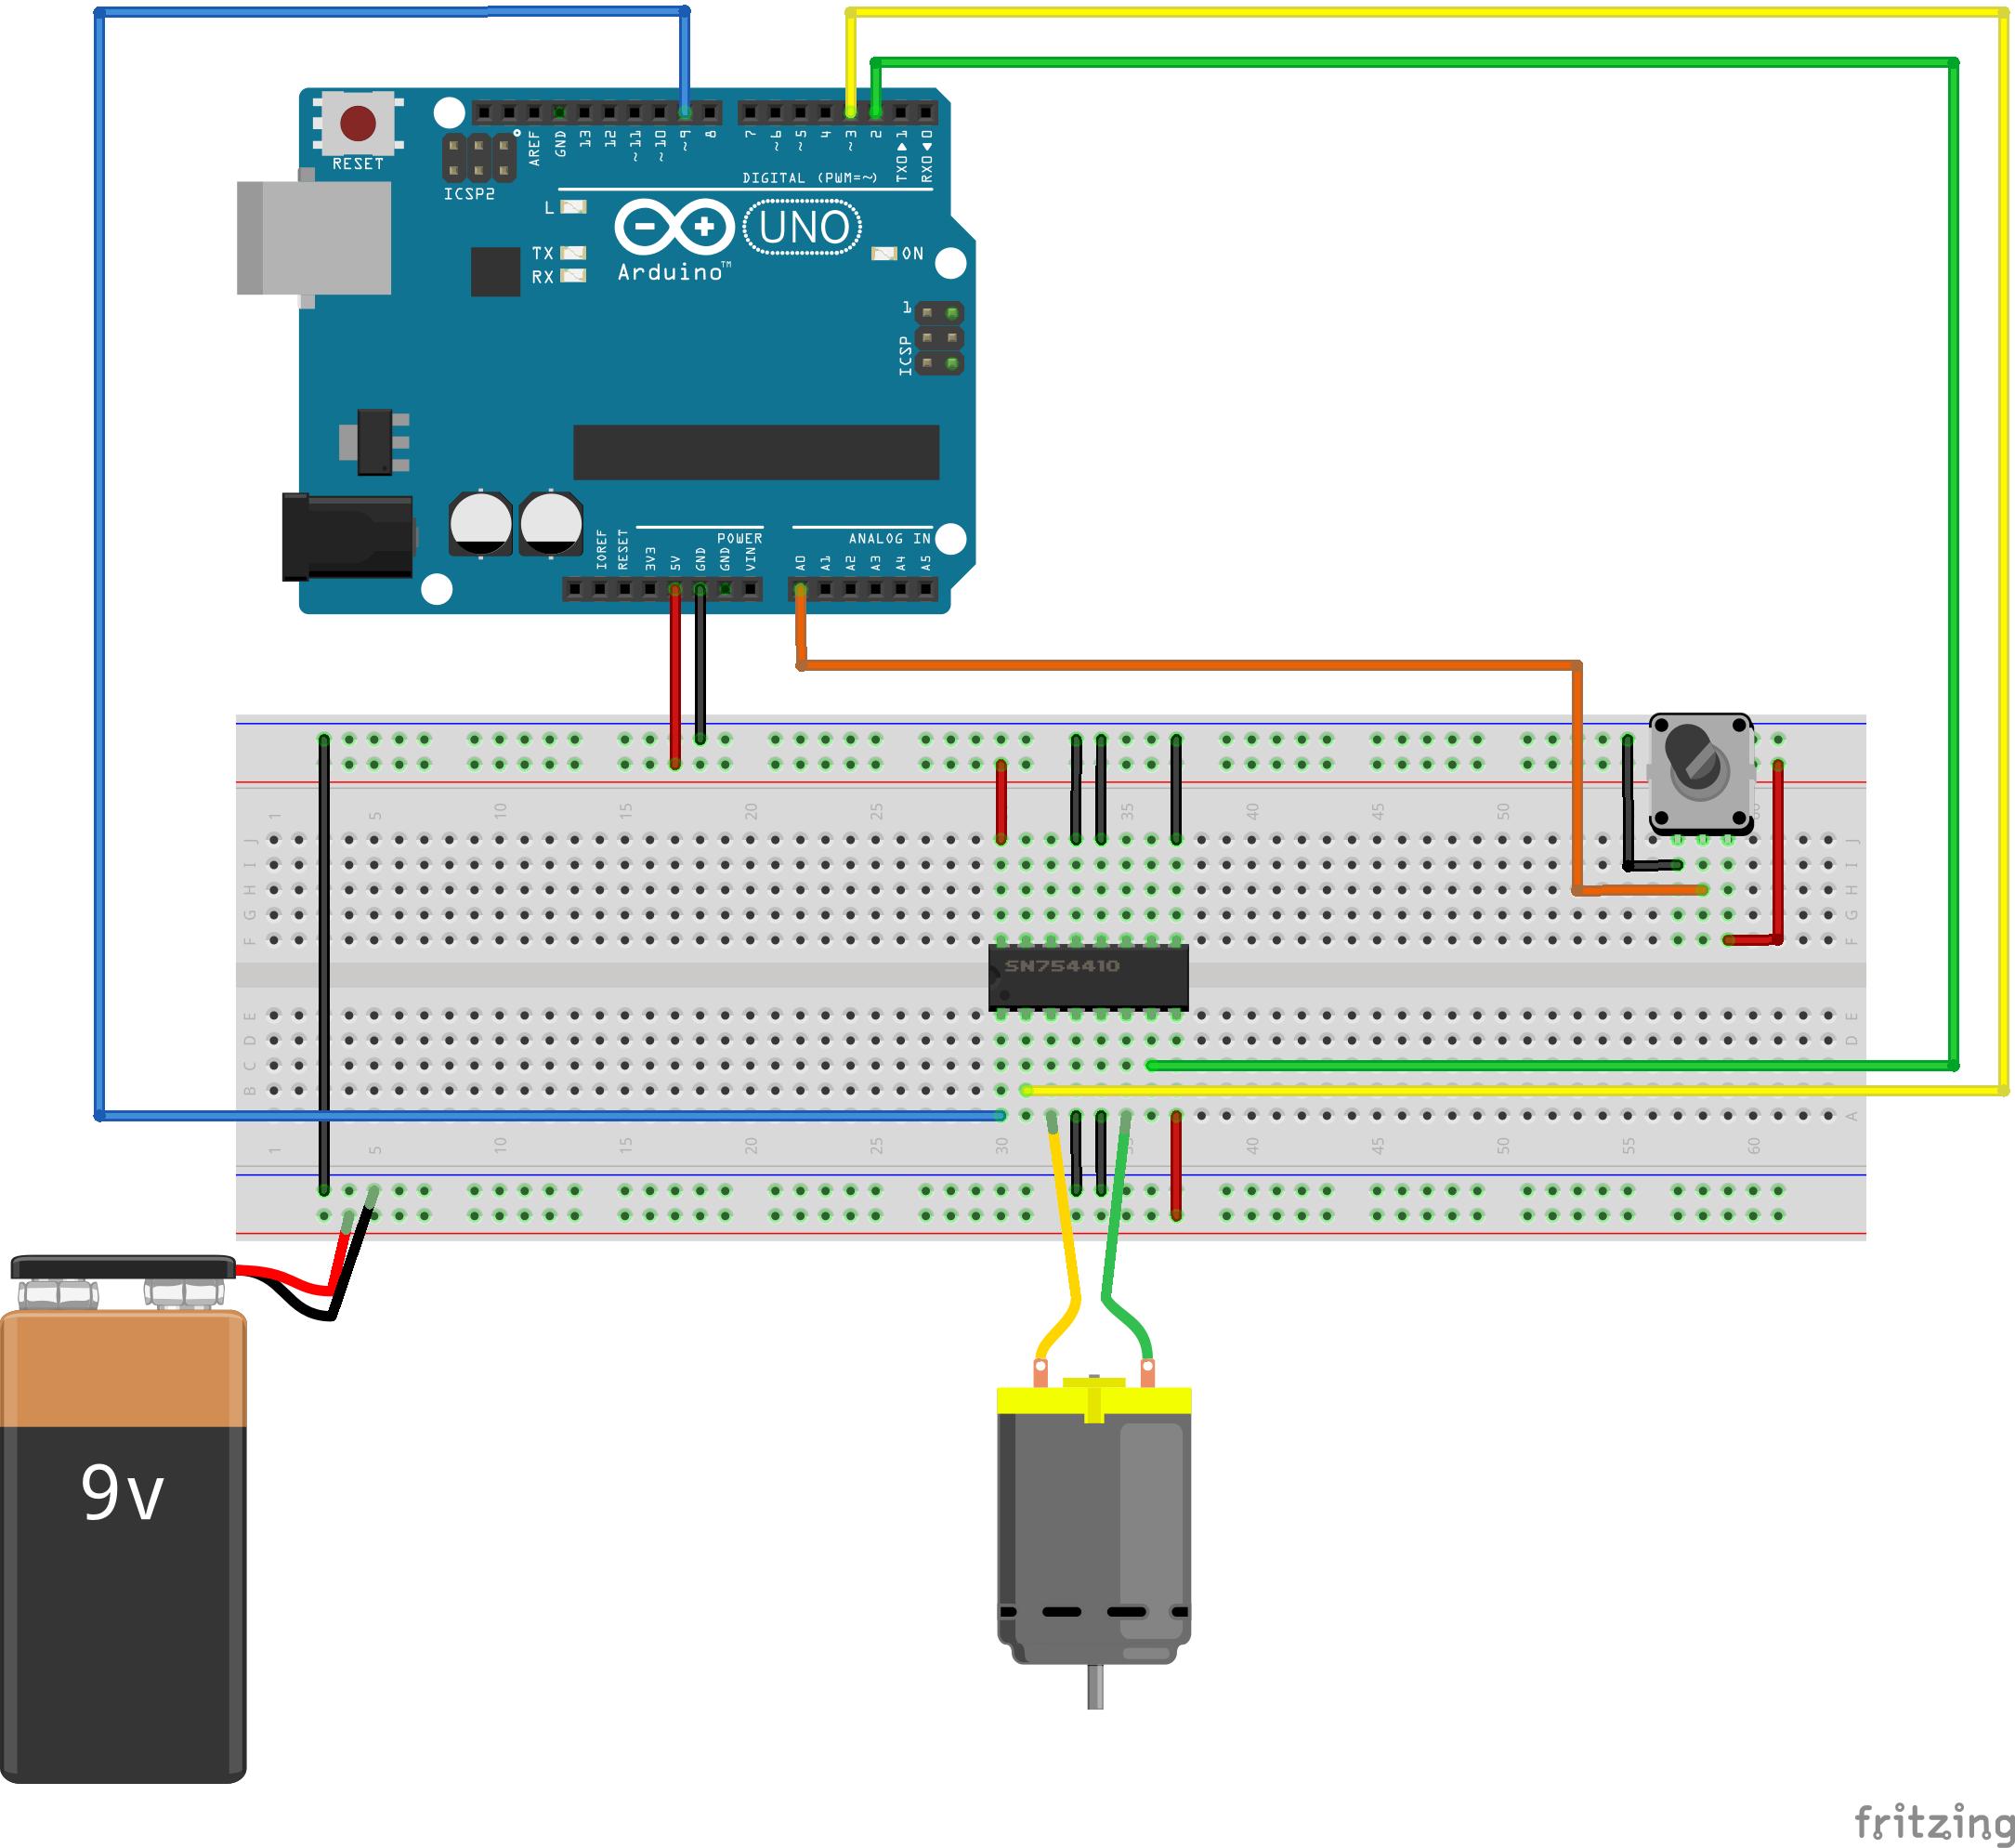 Arduino uno: характеристики, распиновка, питание платы